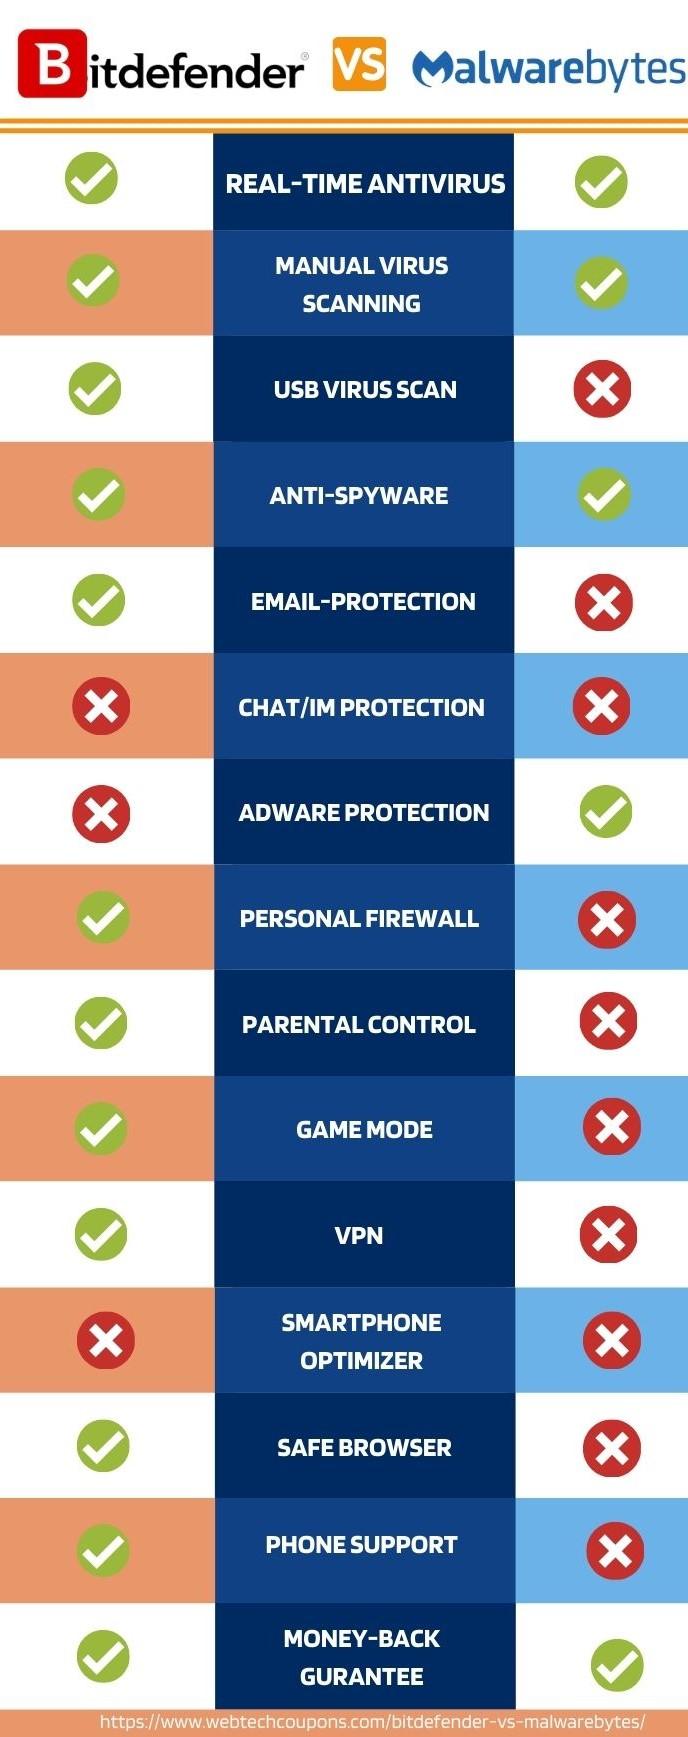 Malwarebytes or bitdefender difference